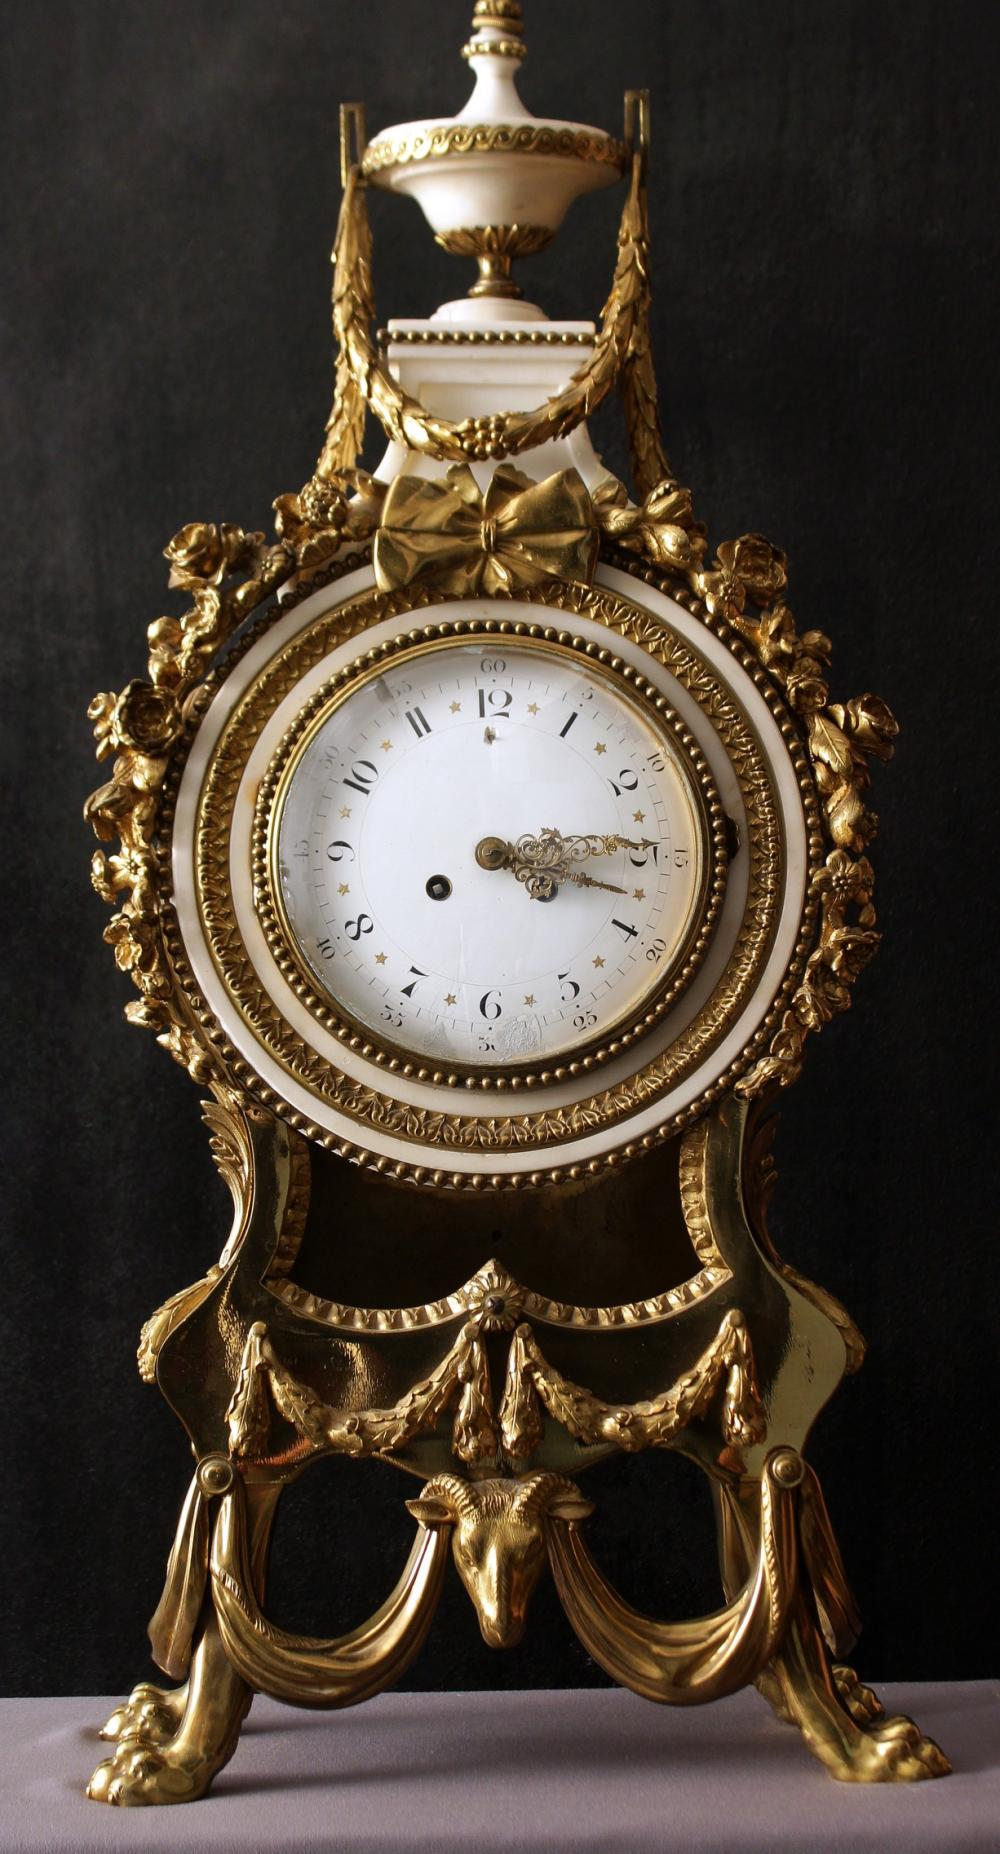 OROLOGIO IN BRONZO E MARMO STILE LUIGI XVI° Francia, XIX° secolo